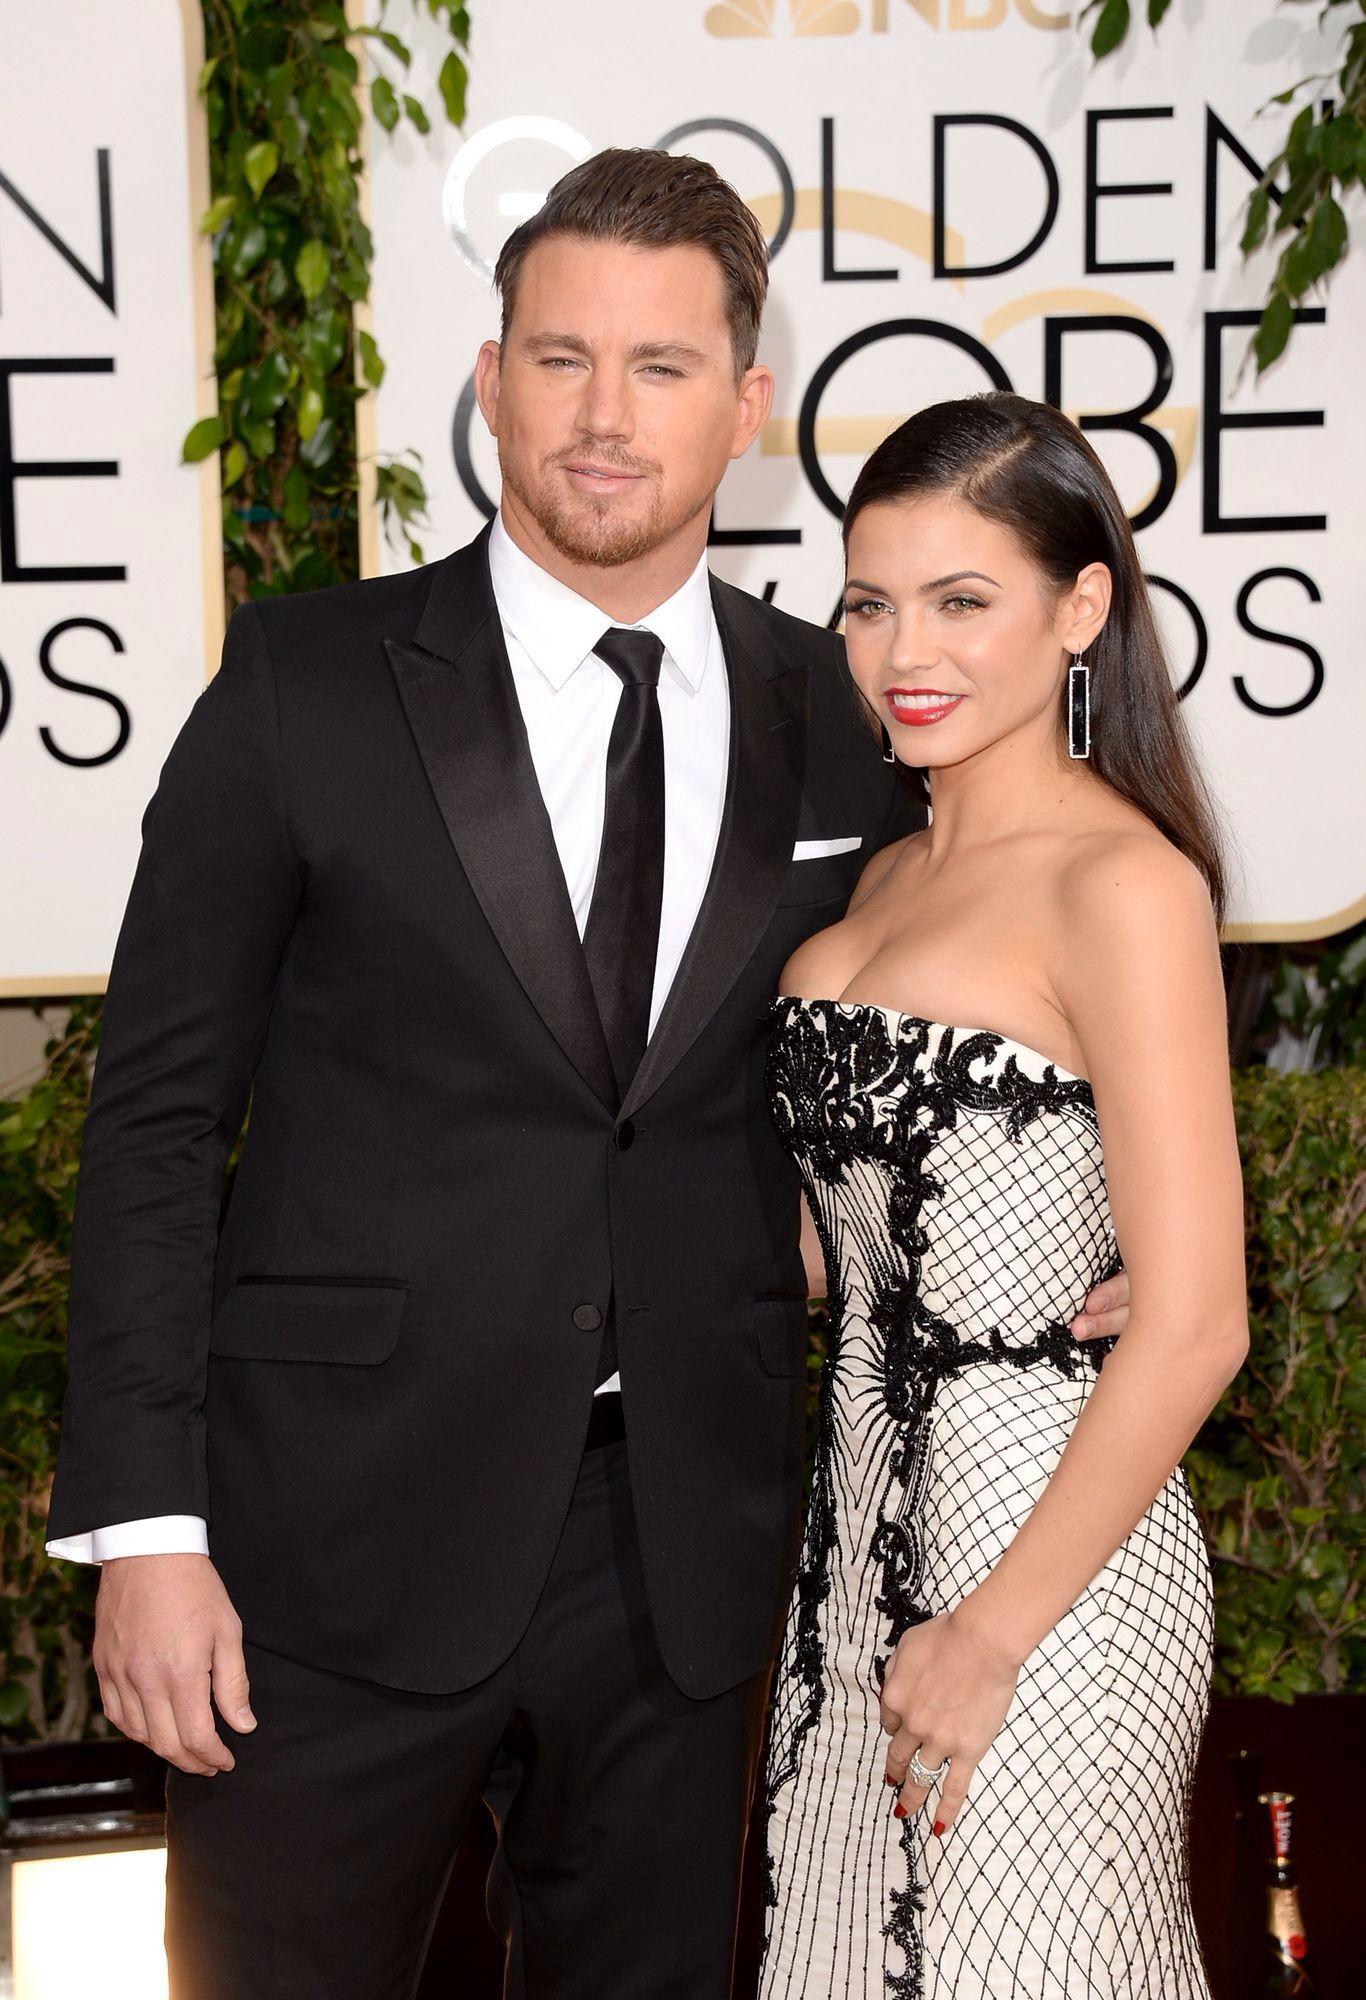 Channing & Jenna :) 2014 Golden Globes